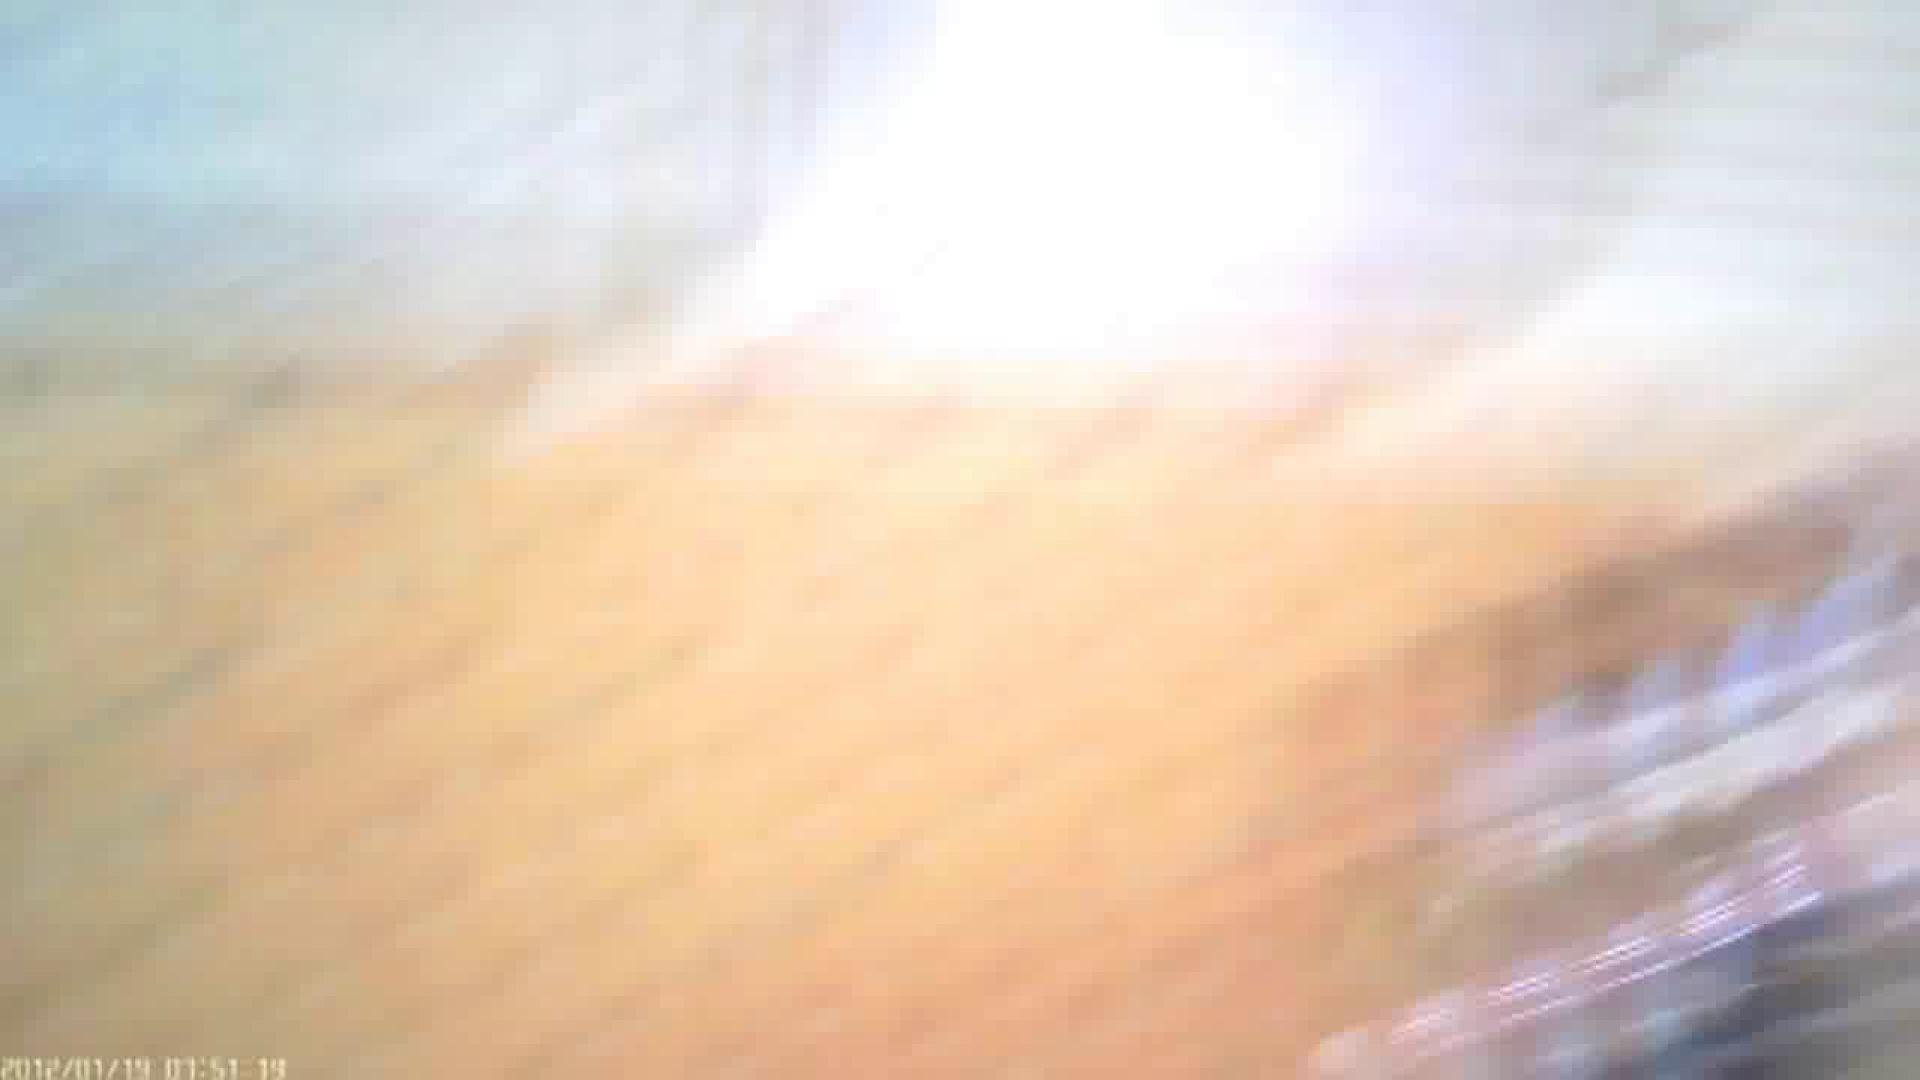 現役ギャル盗撮師 hana様の女風呂潜入撮!Vol.2 銭湯 | 盗撮  91pic 42